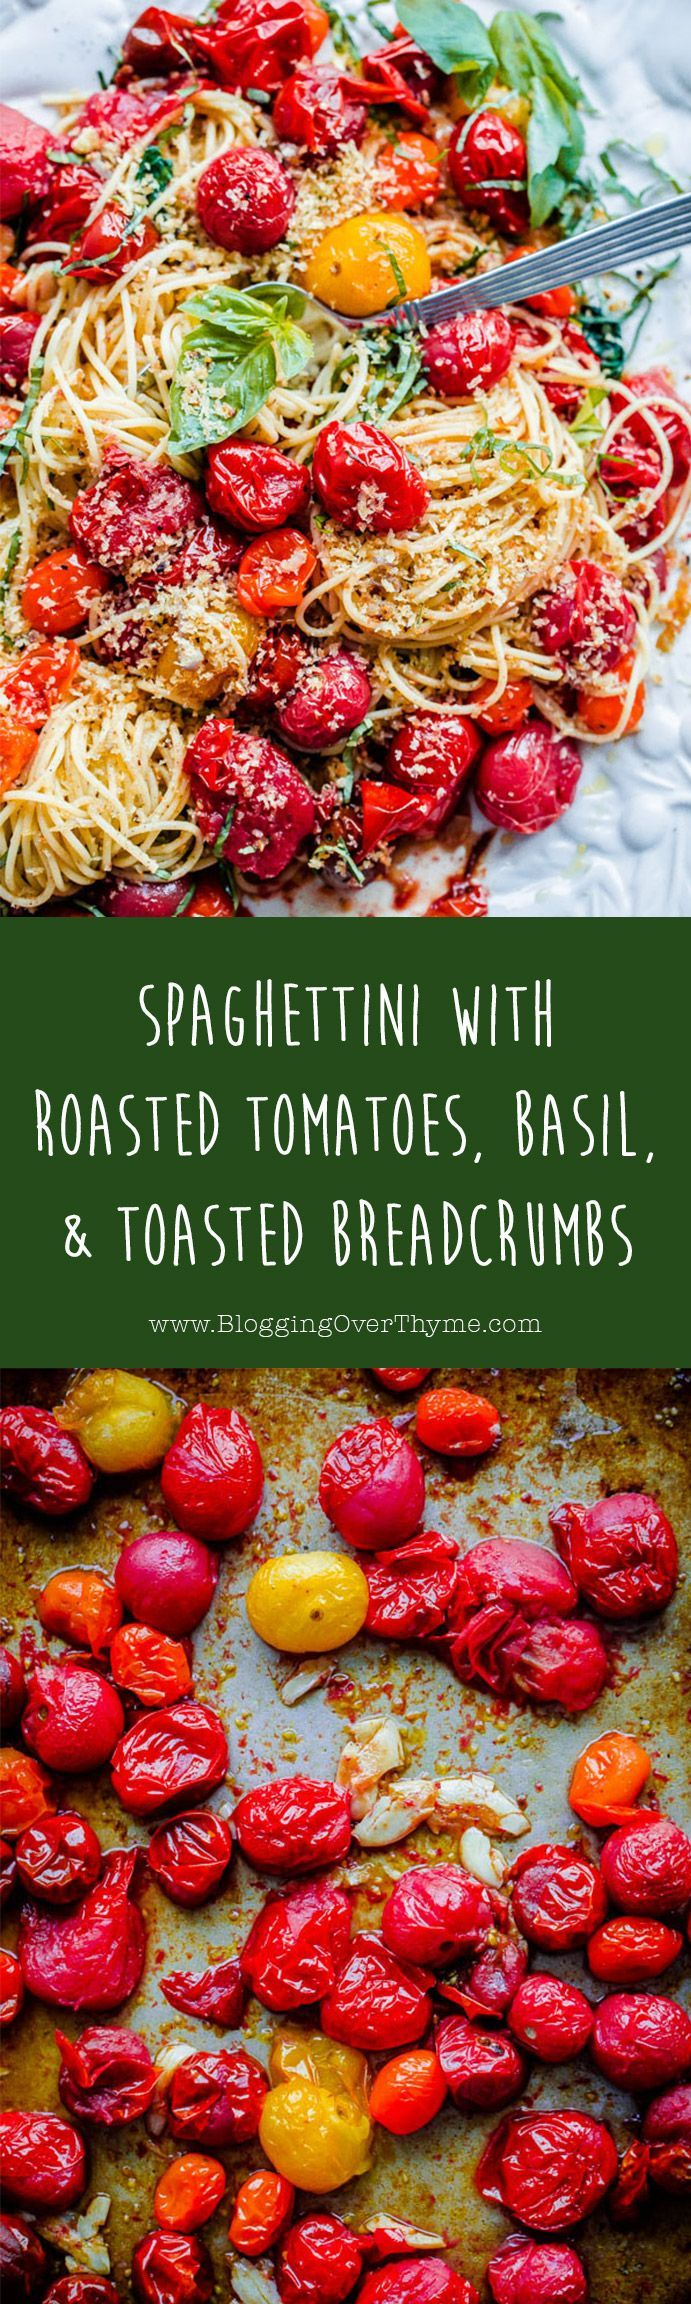 WANT --> Spaghettini with Roasted Tomatoes, Basil & Crispy Breadcrumbs #energy #pastalove